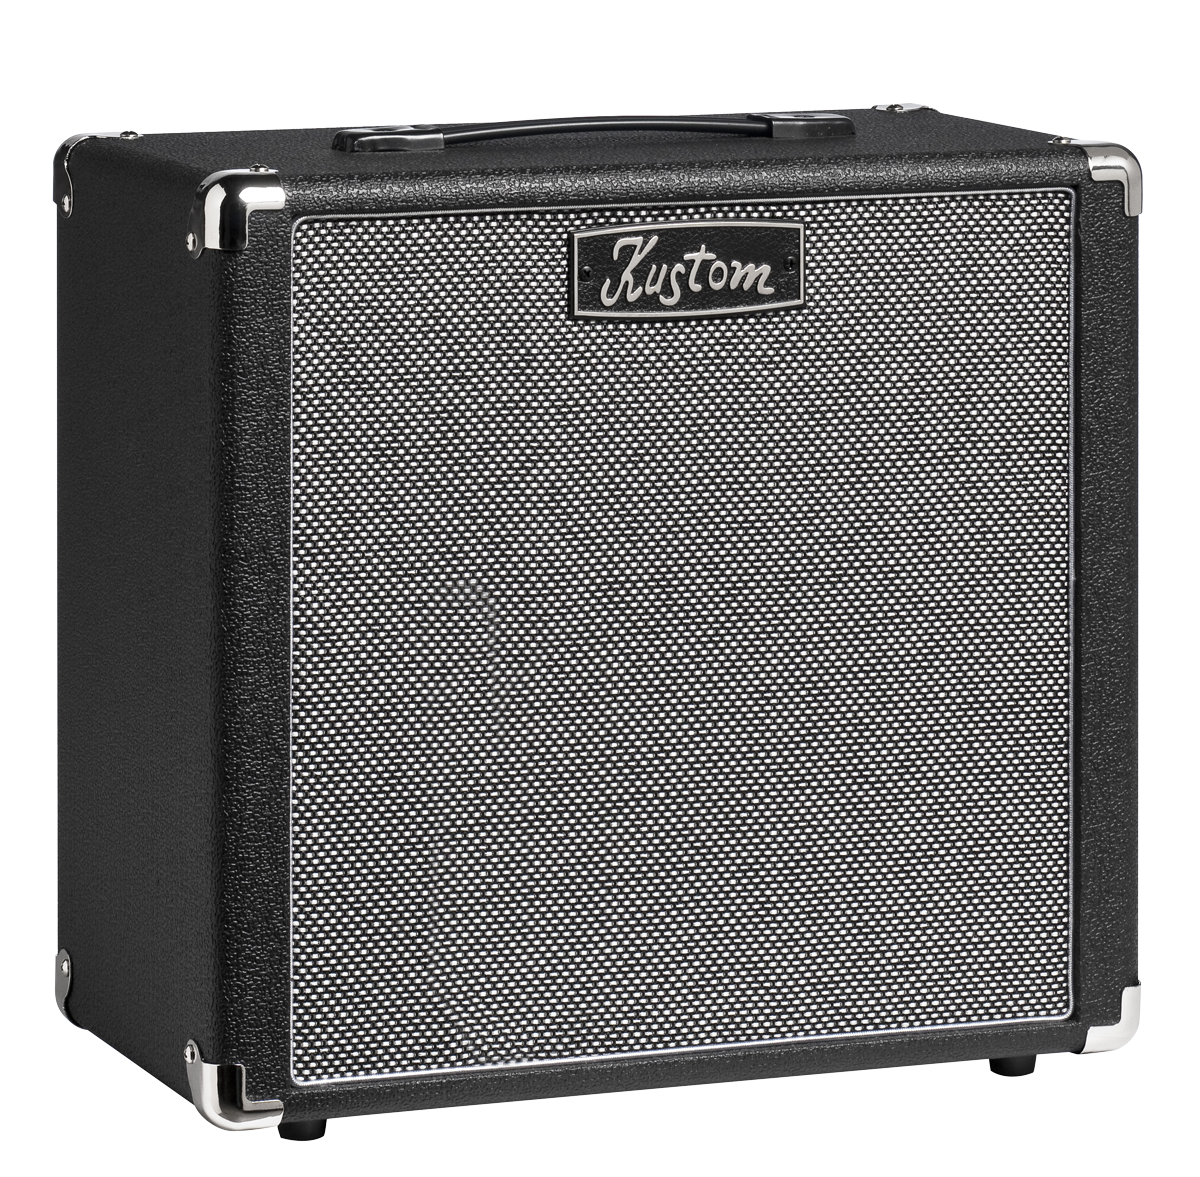 Kustom 1x12 Cabinet Defender 1x12 Kustom Guitar Cabinet